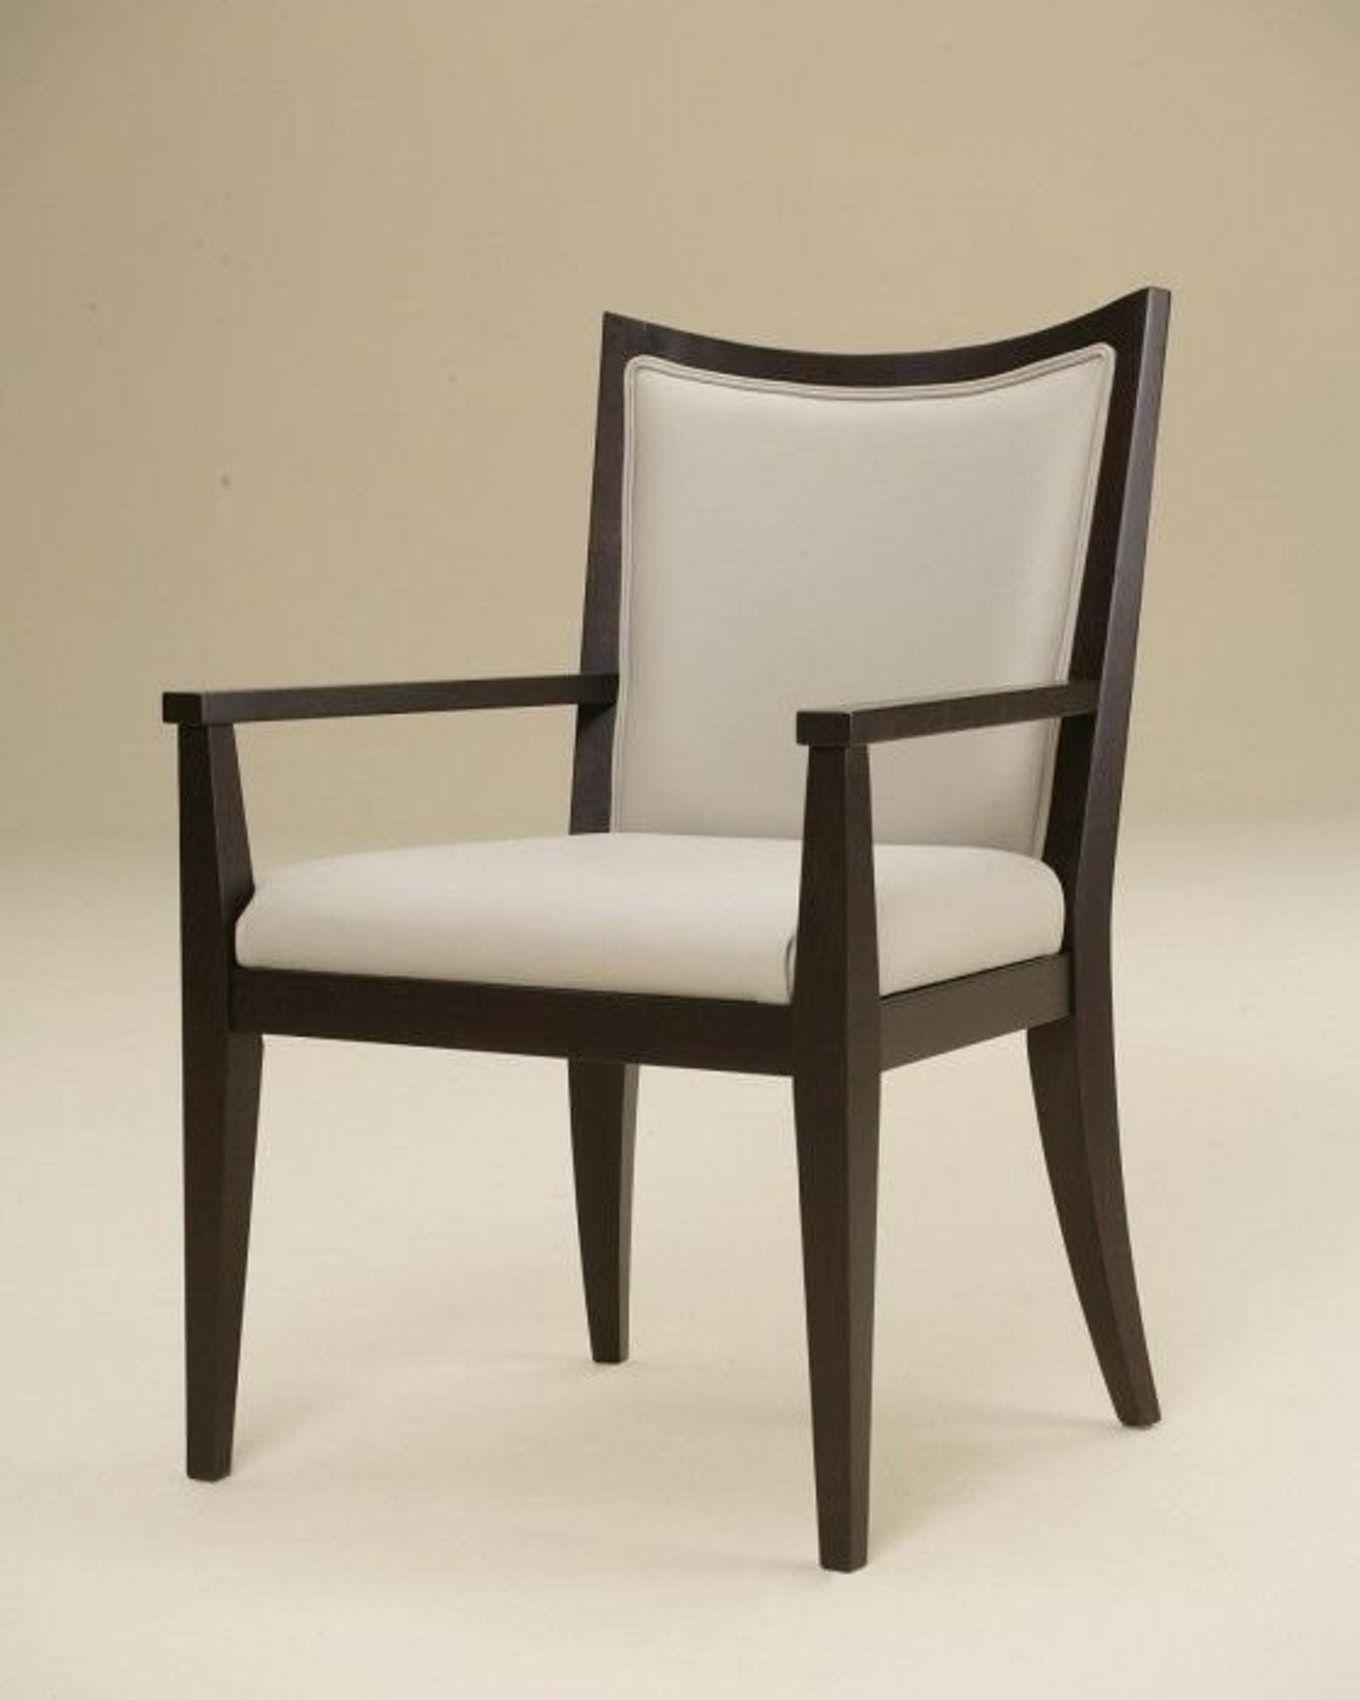 Esszimmer Stuhl Stoff Grau Esszimmer Stühle Blau Holz Ess